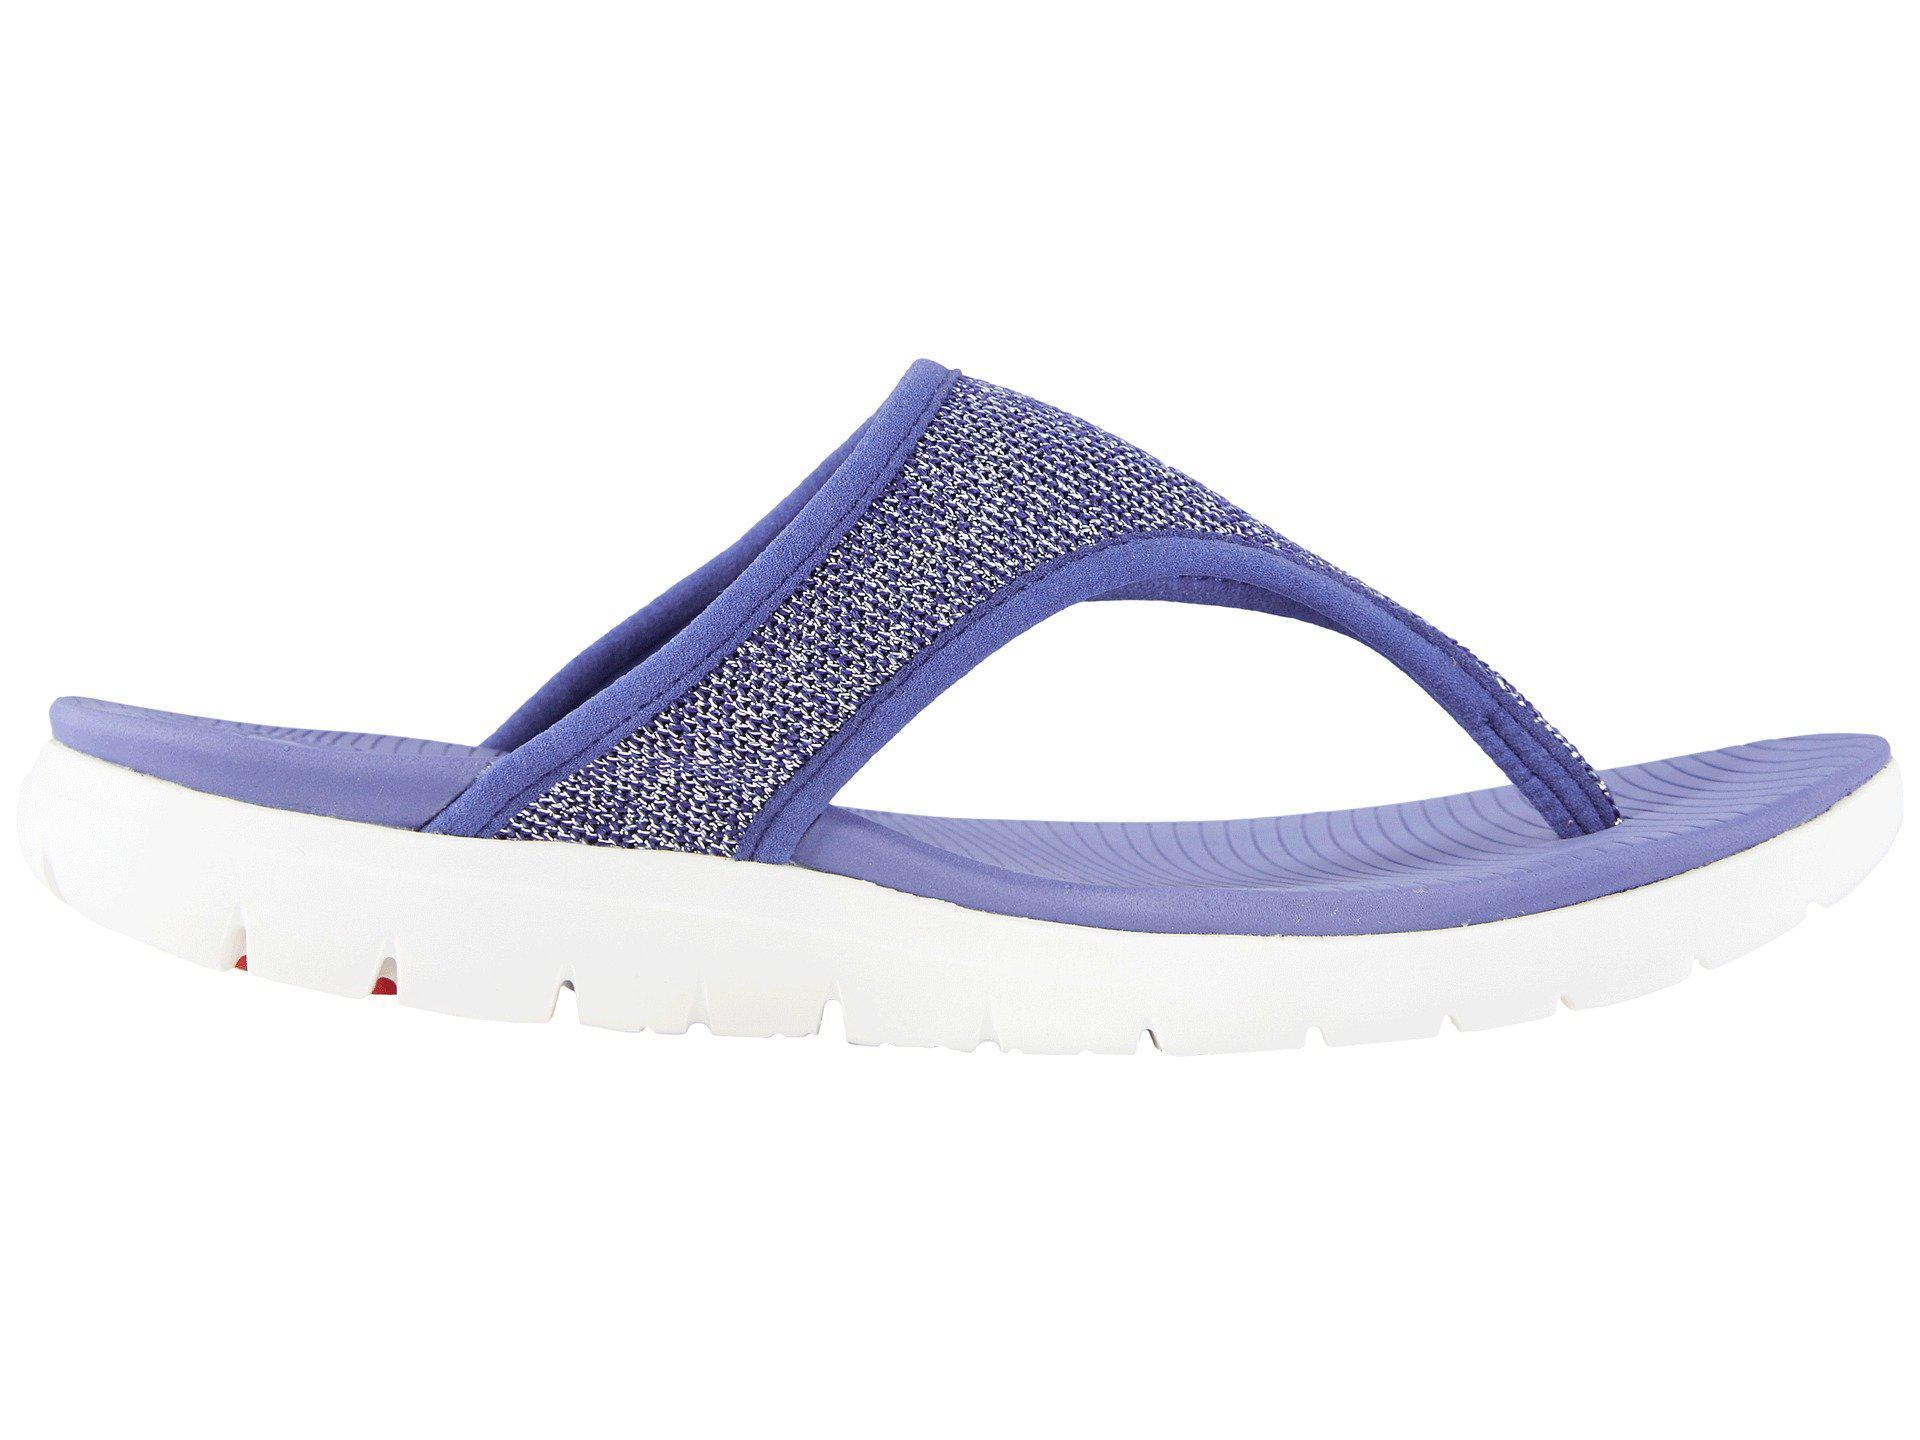 Fitflop Uberknit Toe Thong Sandals in